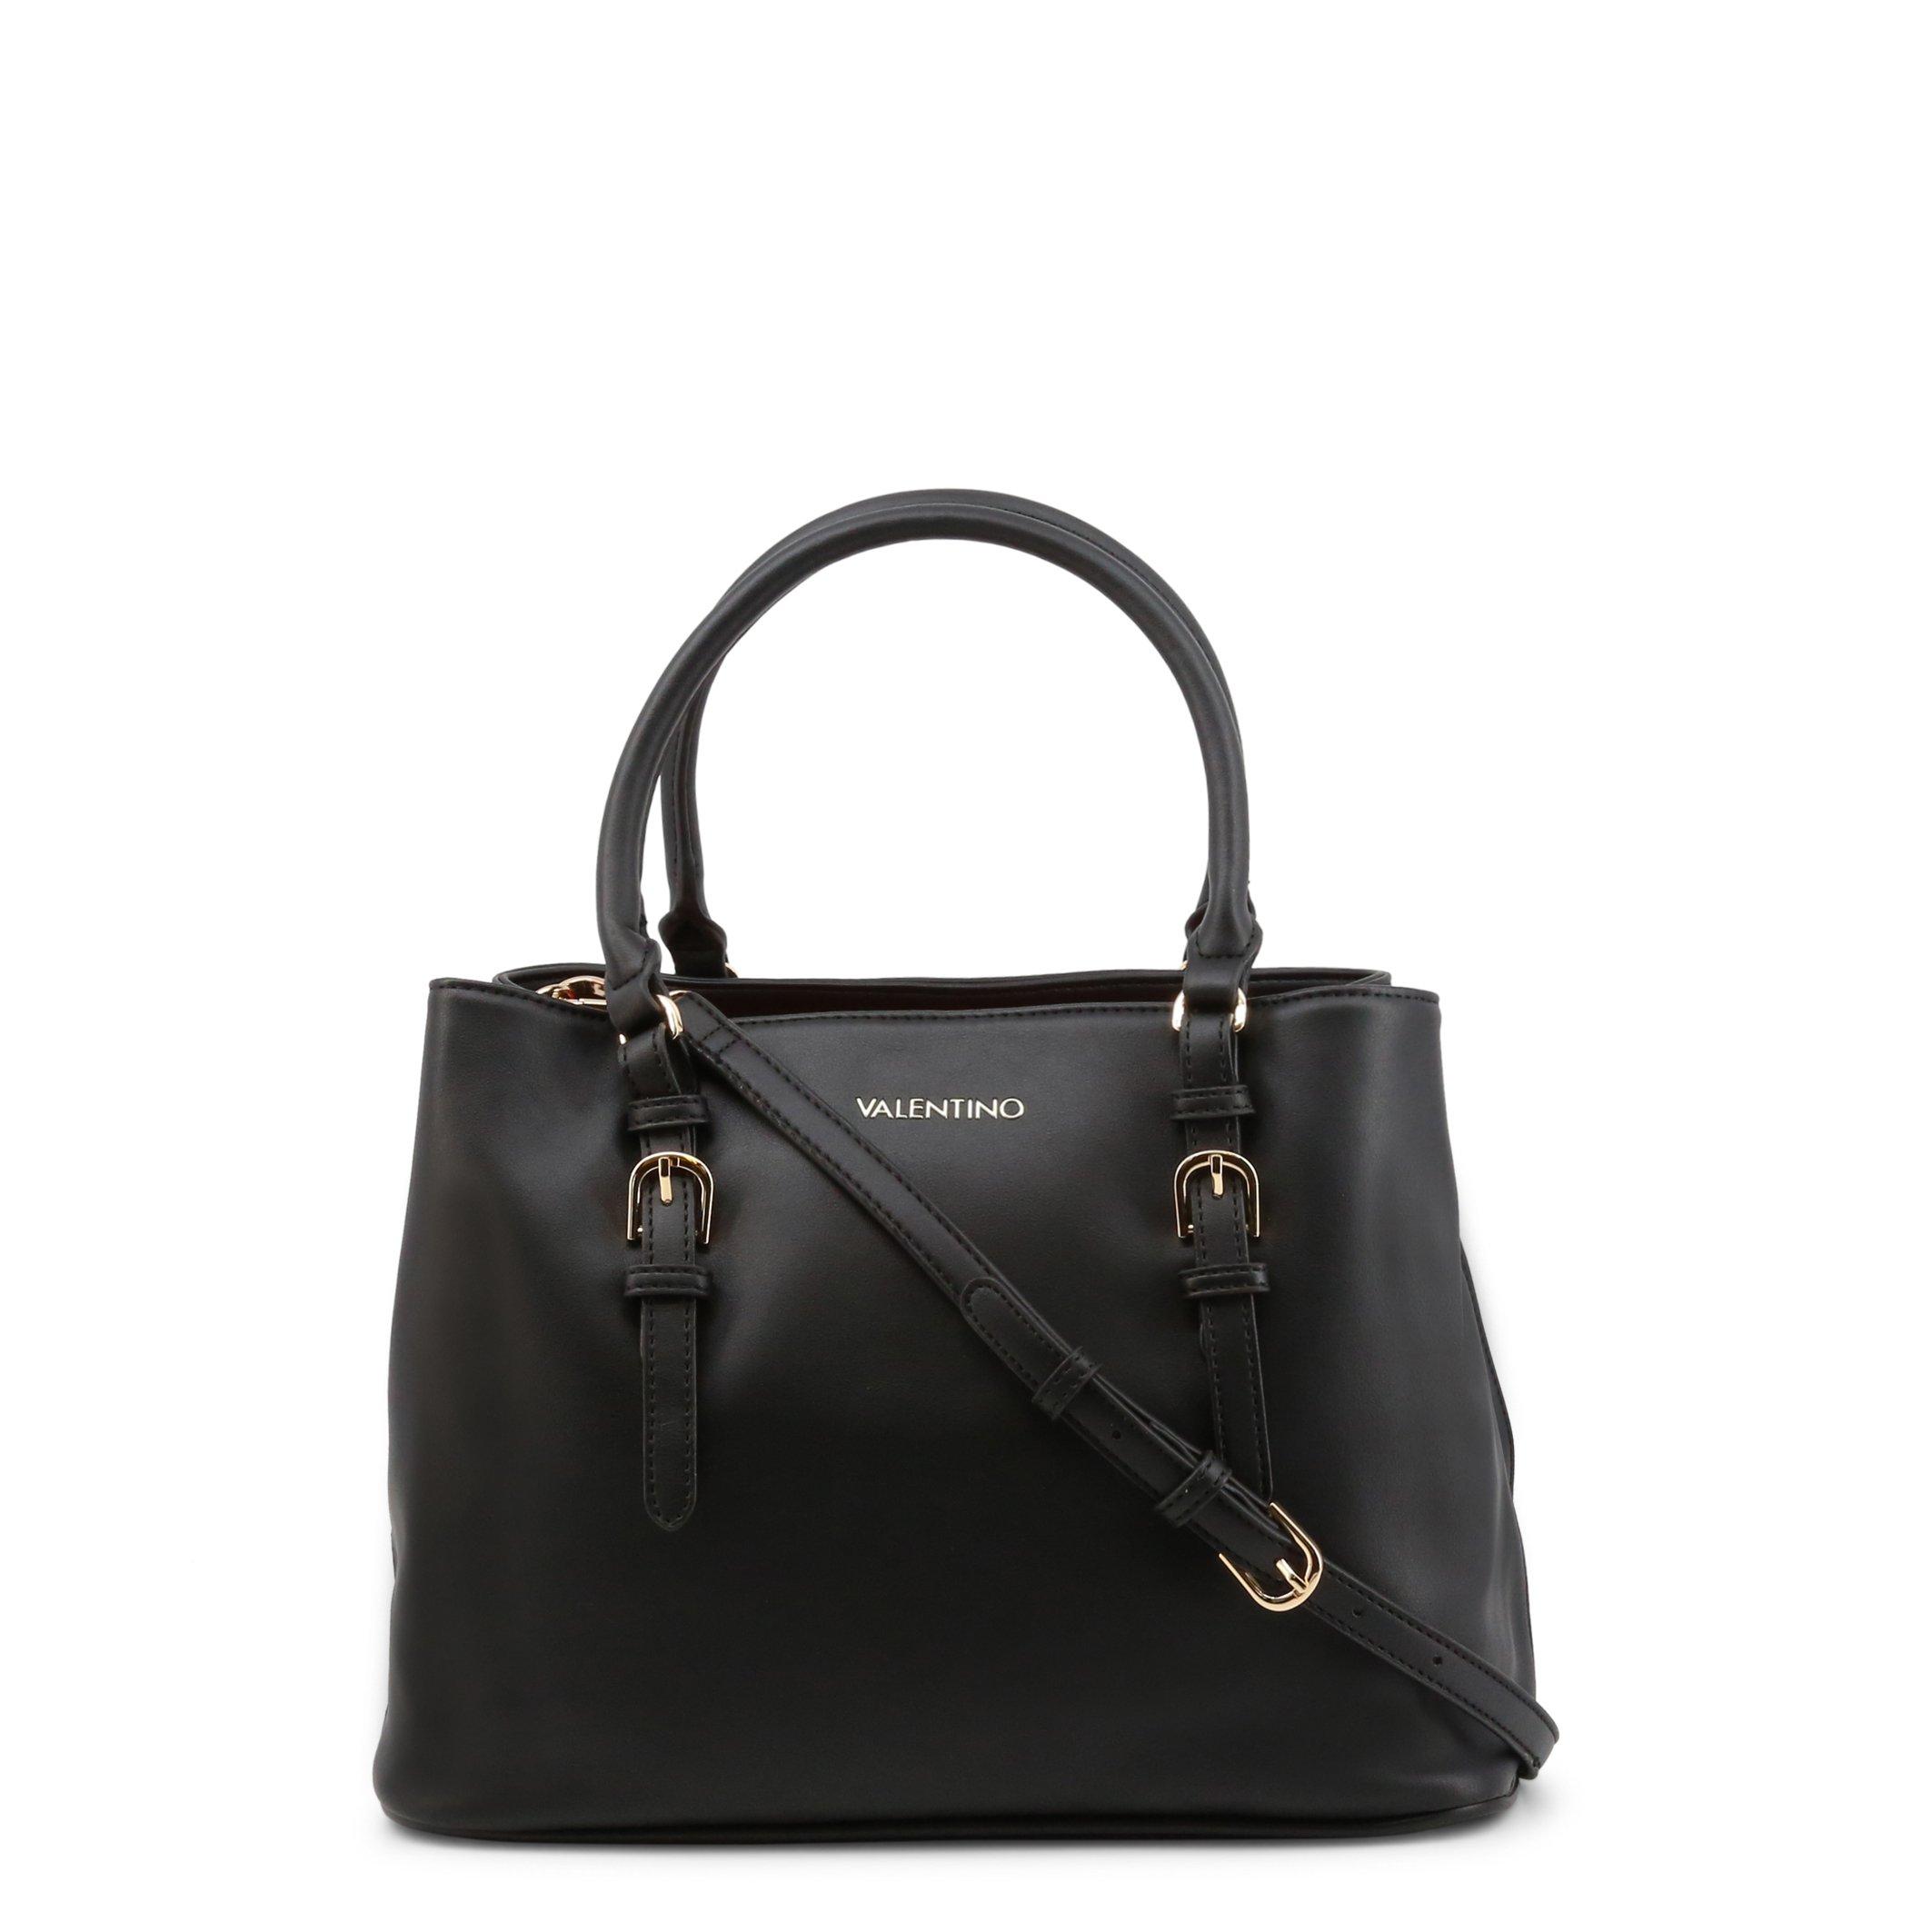 Valentino by Mario Valentino Women's Shoulder Bag Various Colours MEDUSA-VBS52O01 - black NOSIZE